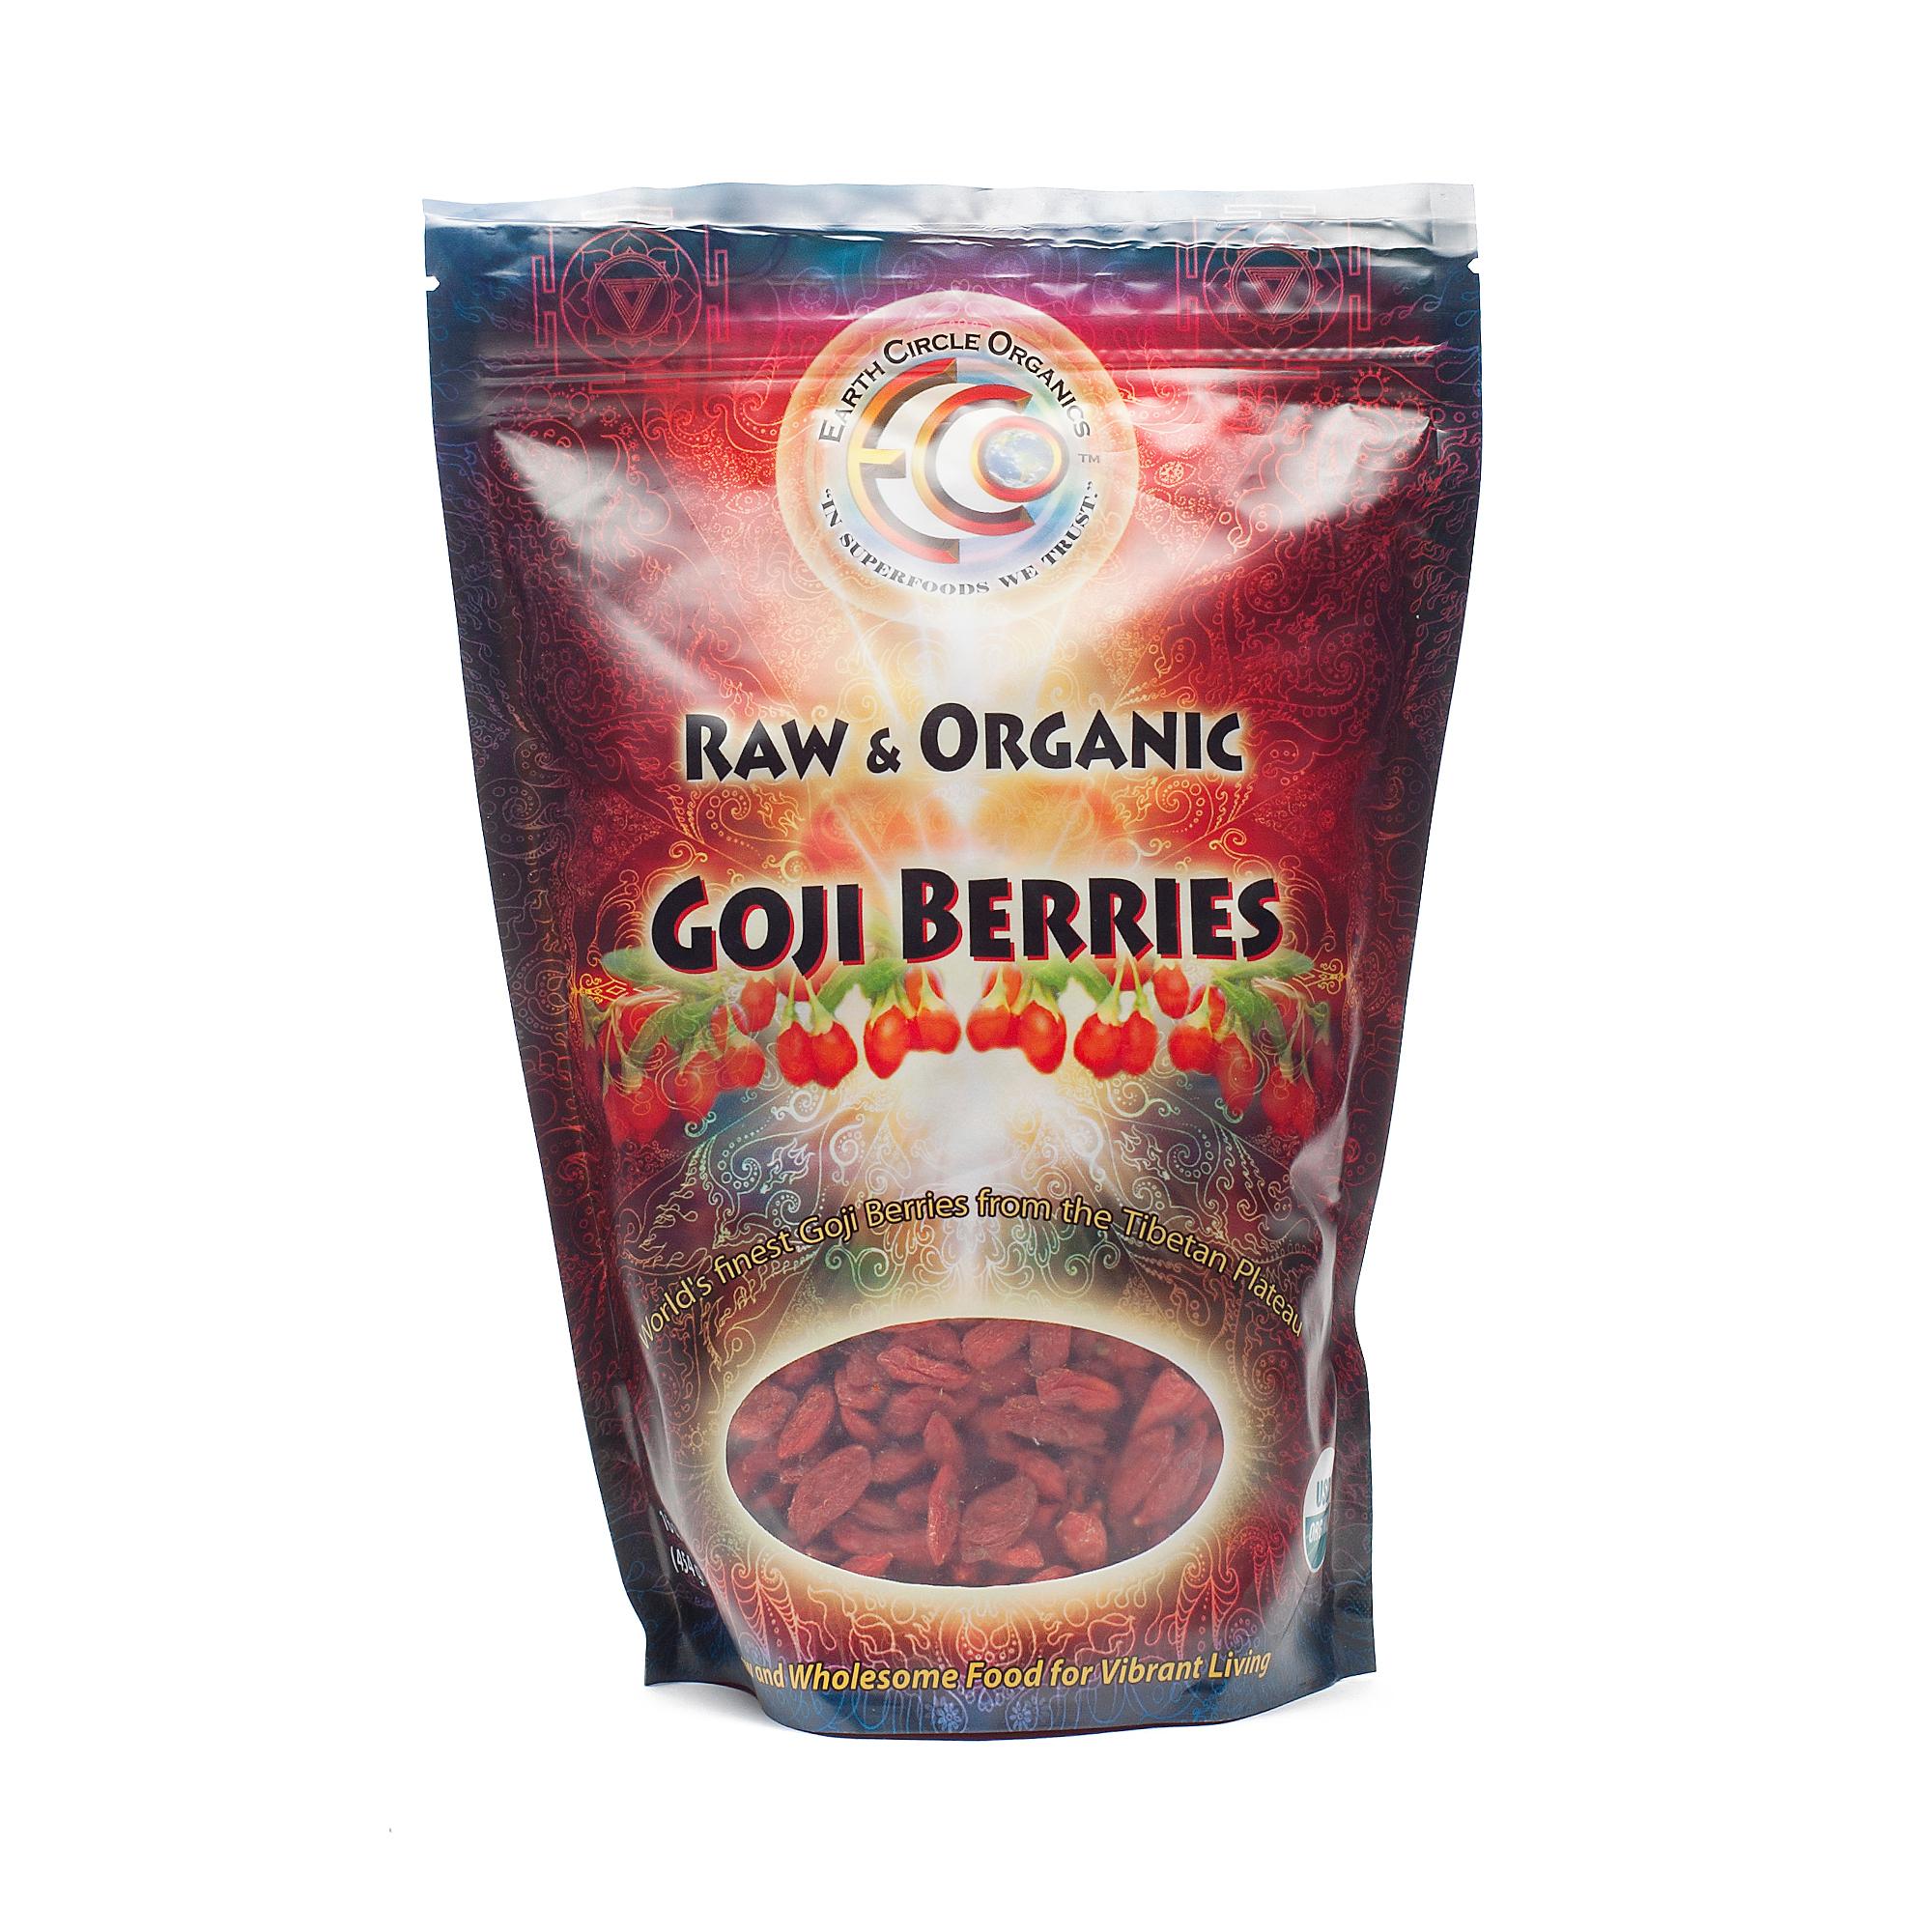 Tibetan Plateau Organic Goji Berries